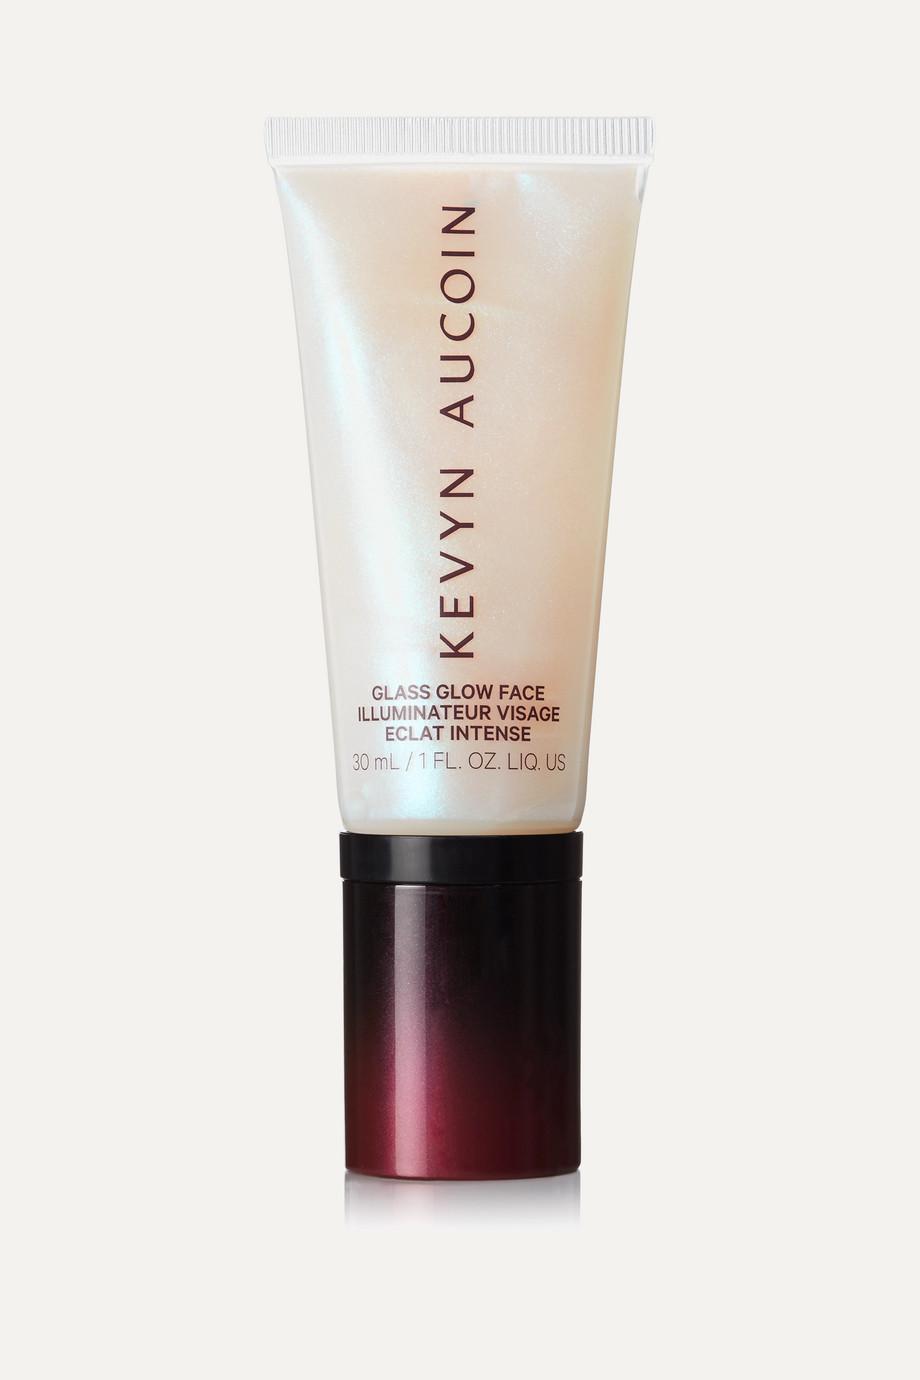 Kevyn Aucoin Illuminateur visage éclat intense, Crystal Clear, 30 ml